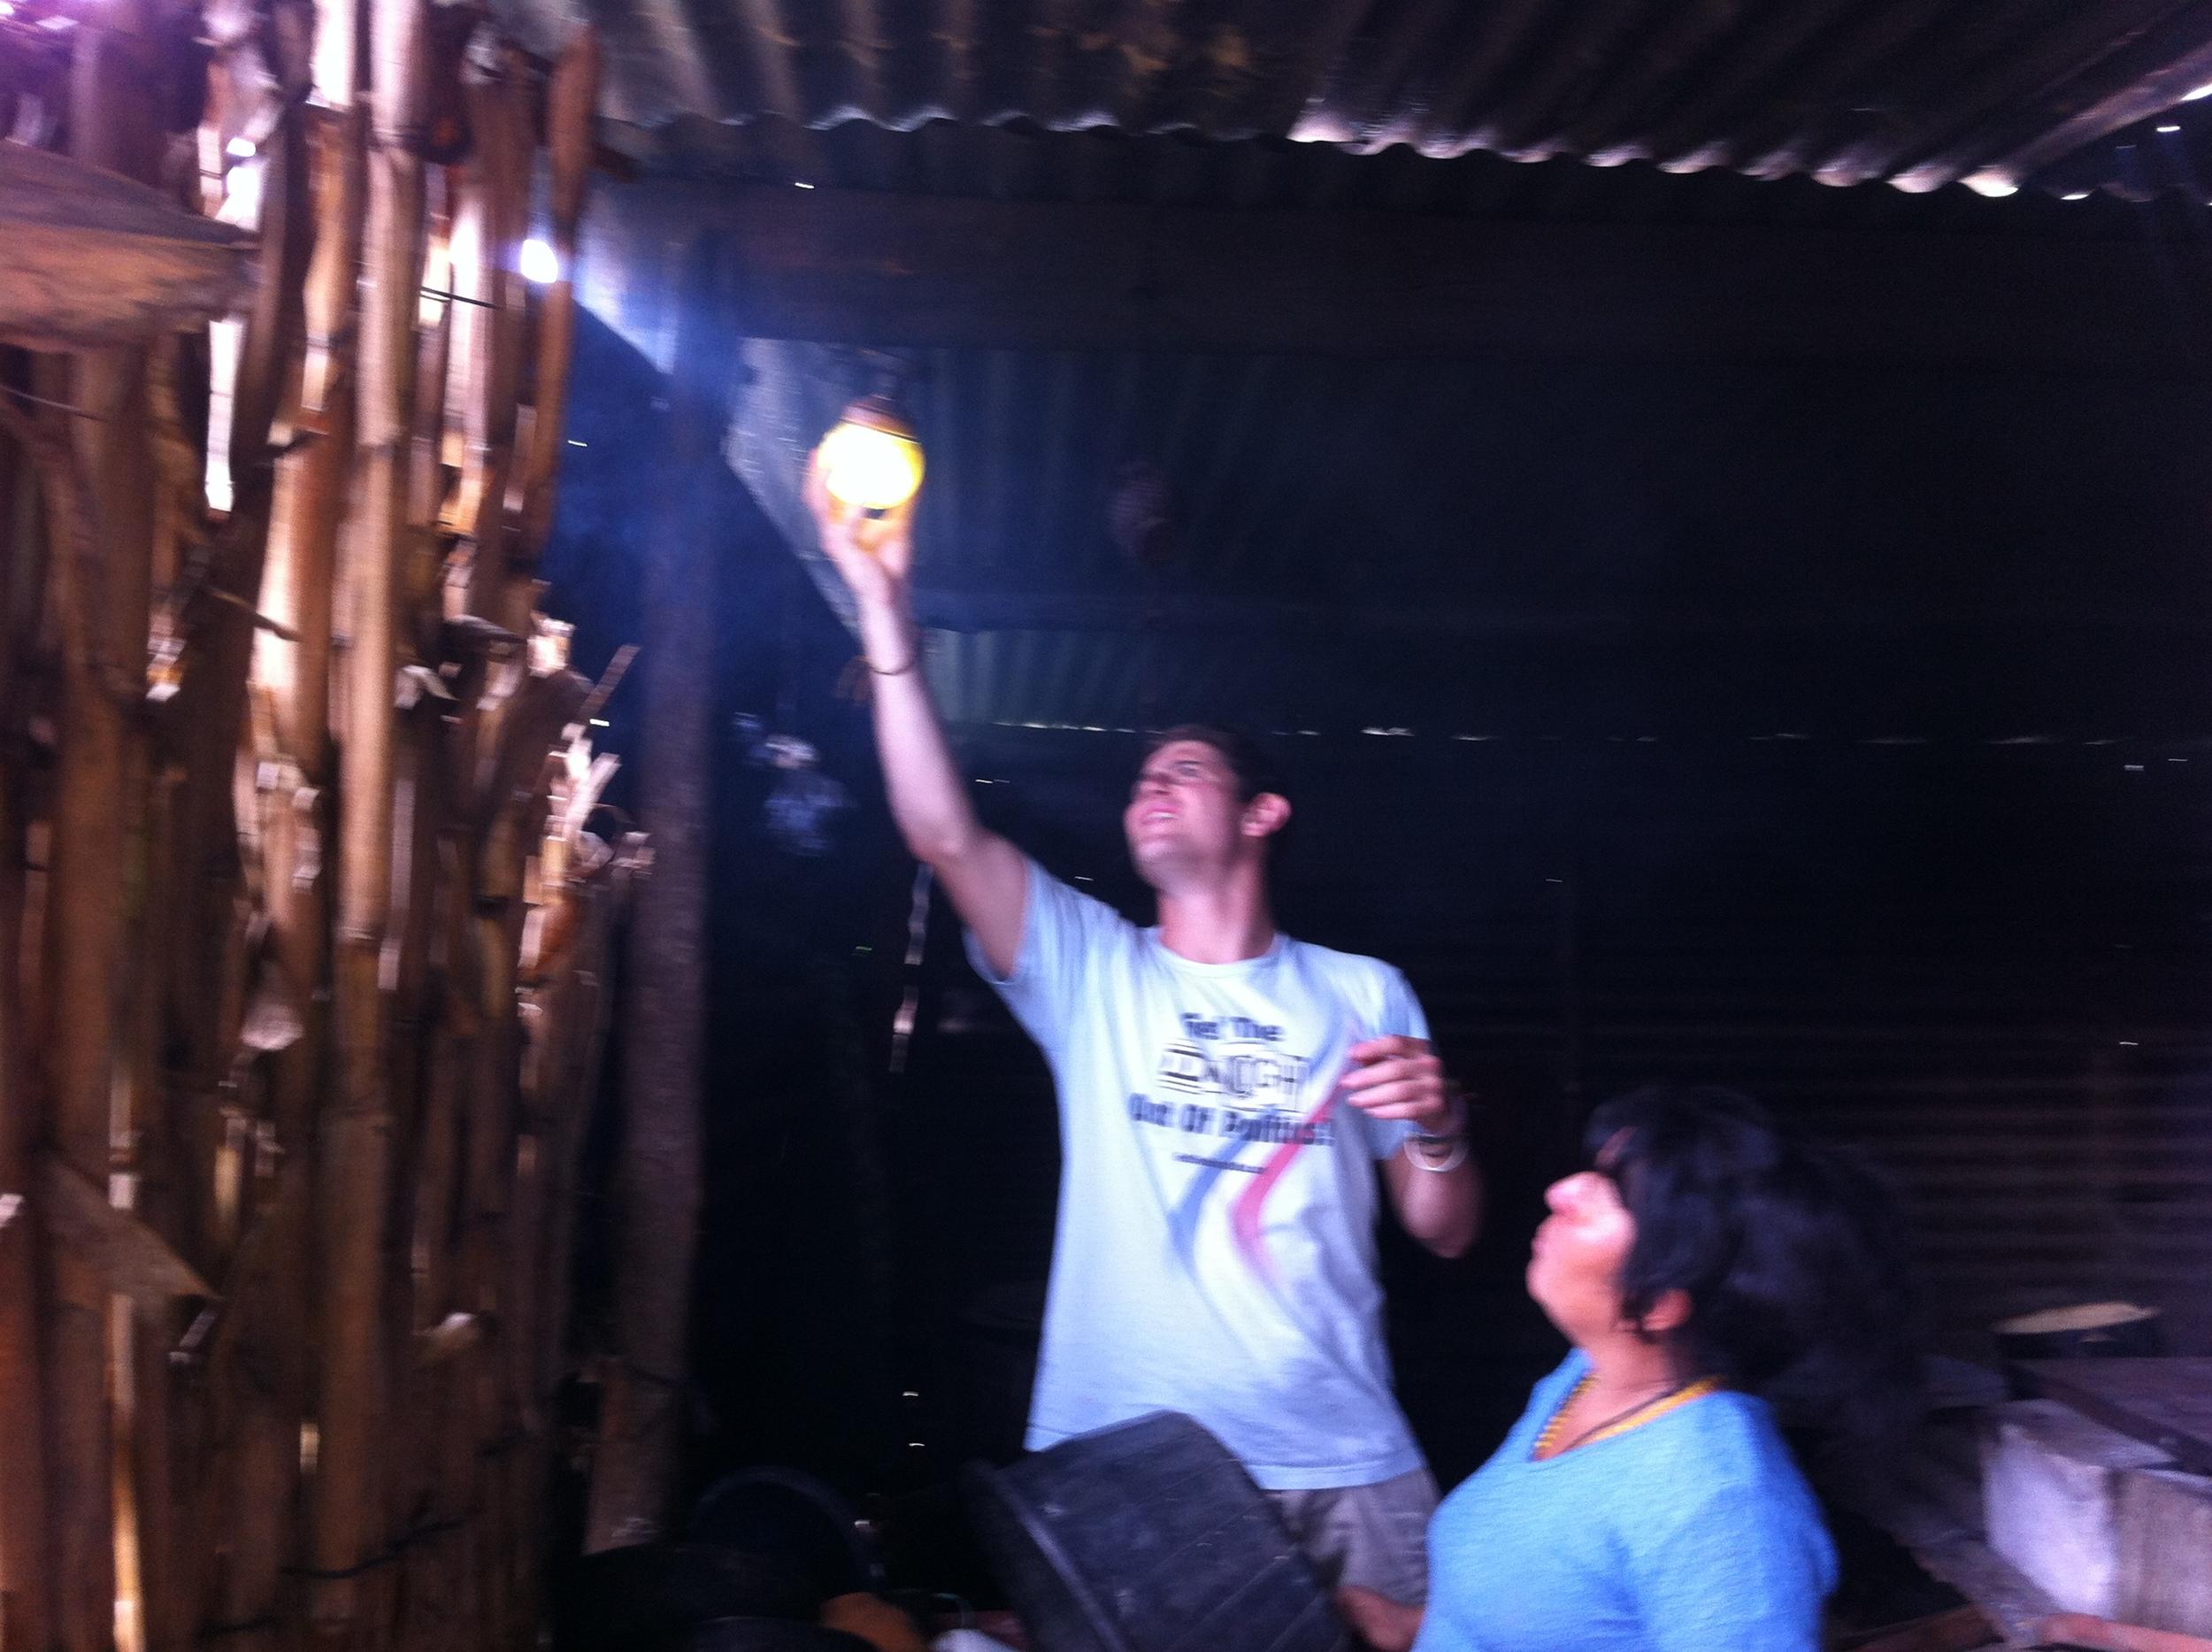 Alex providing solar energy units in rural Guatemalan villages.